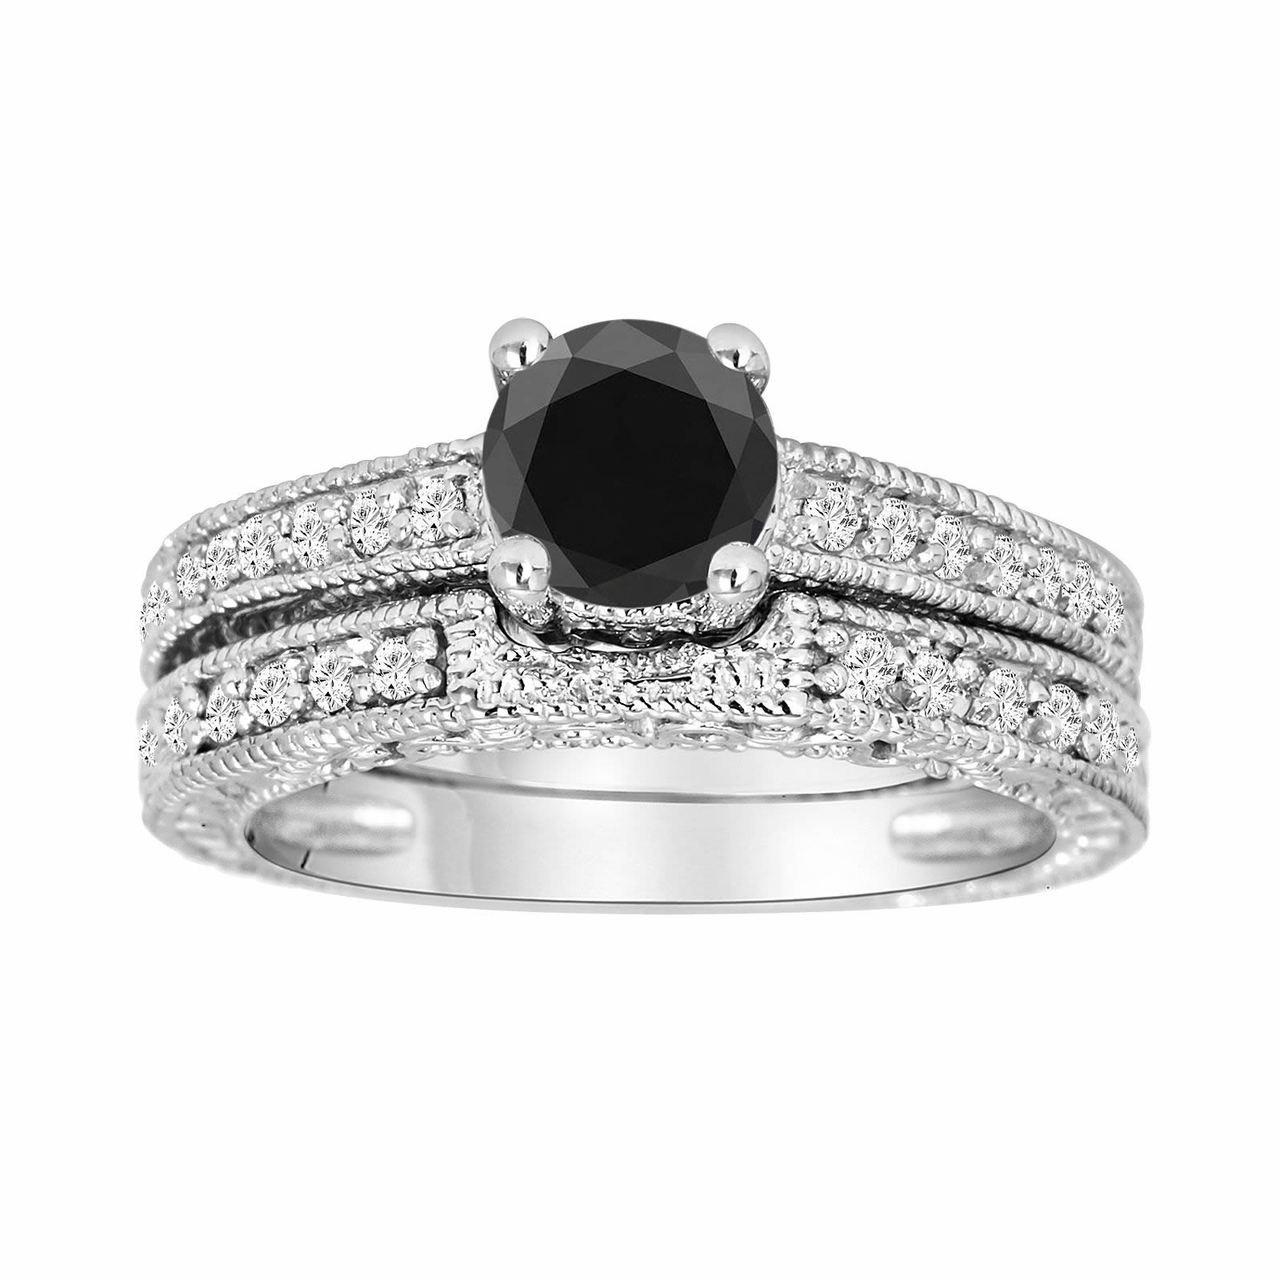 AAA Natural   Black Diamond Wedding Band Ring 14k White Gold-Specail